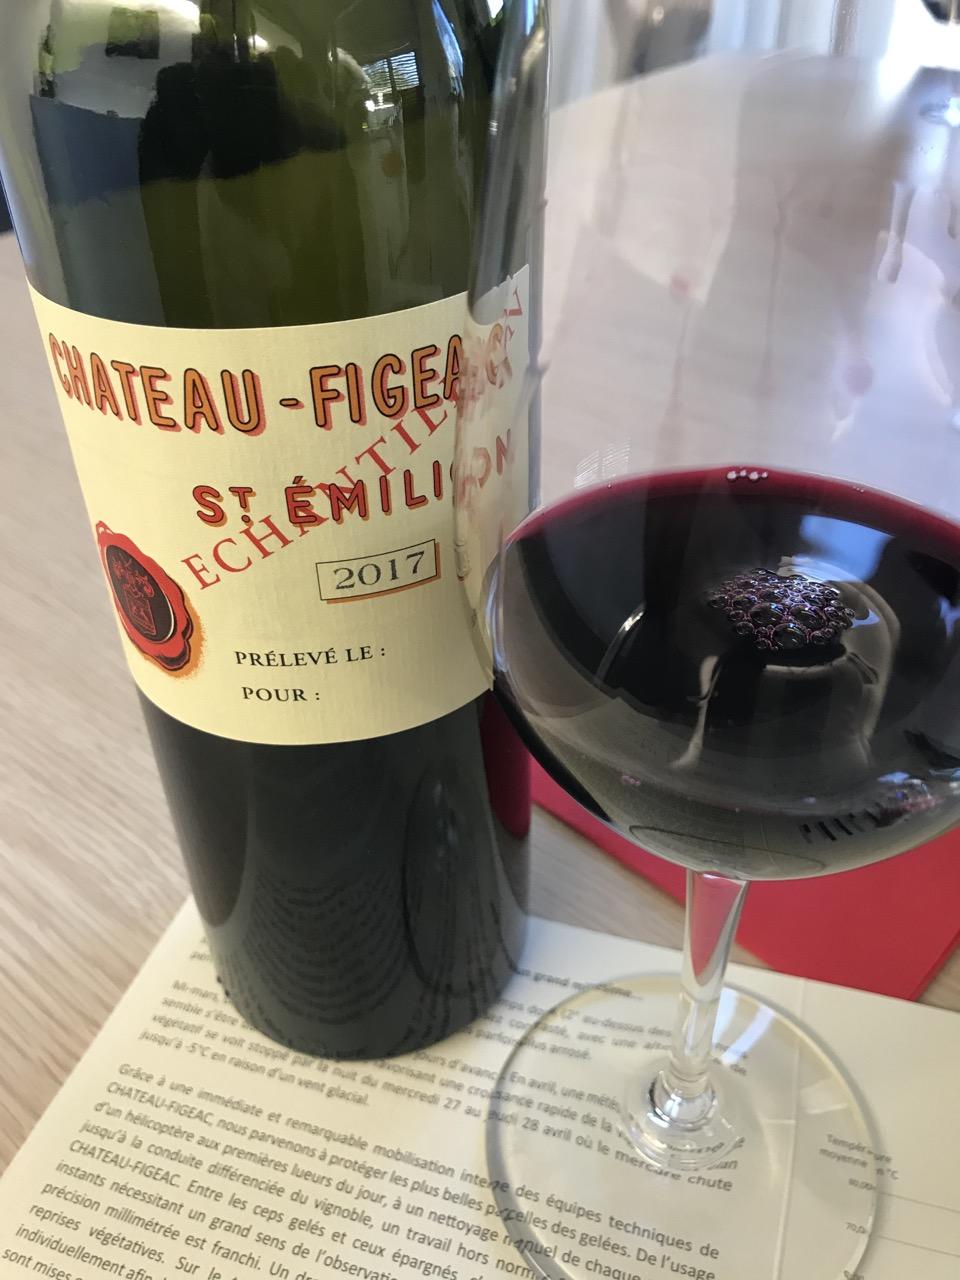 Freshness from Saint Emilion: Bordeaux 2017 from barrel